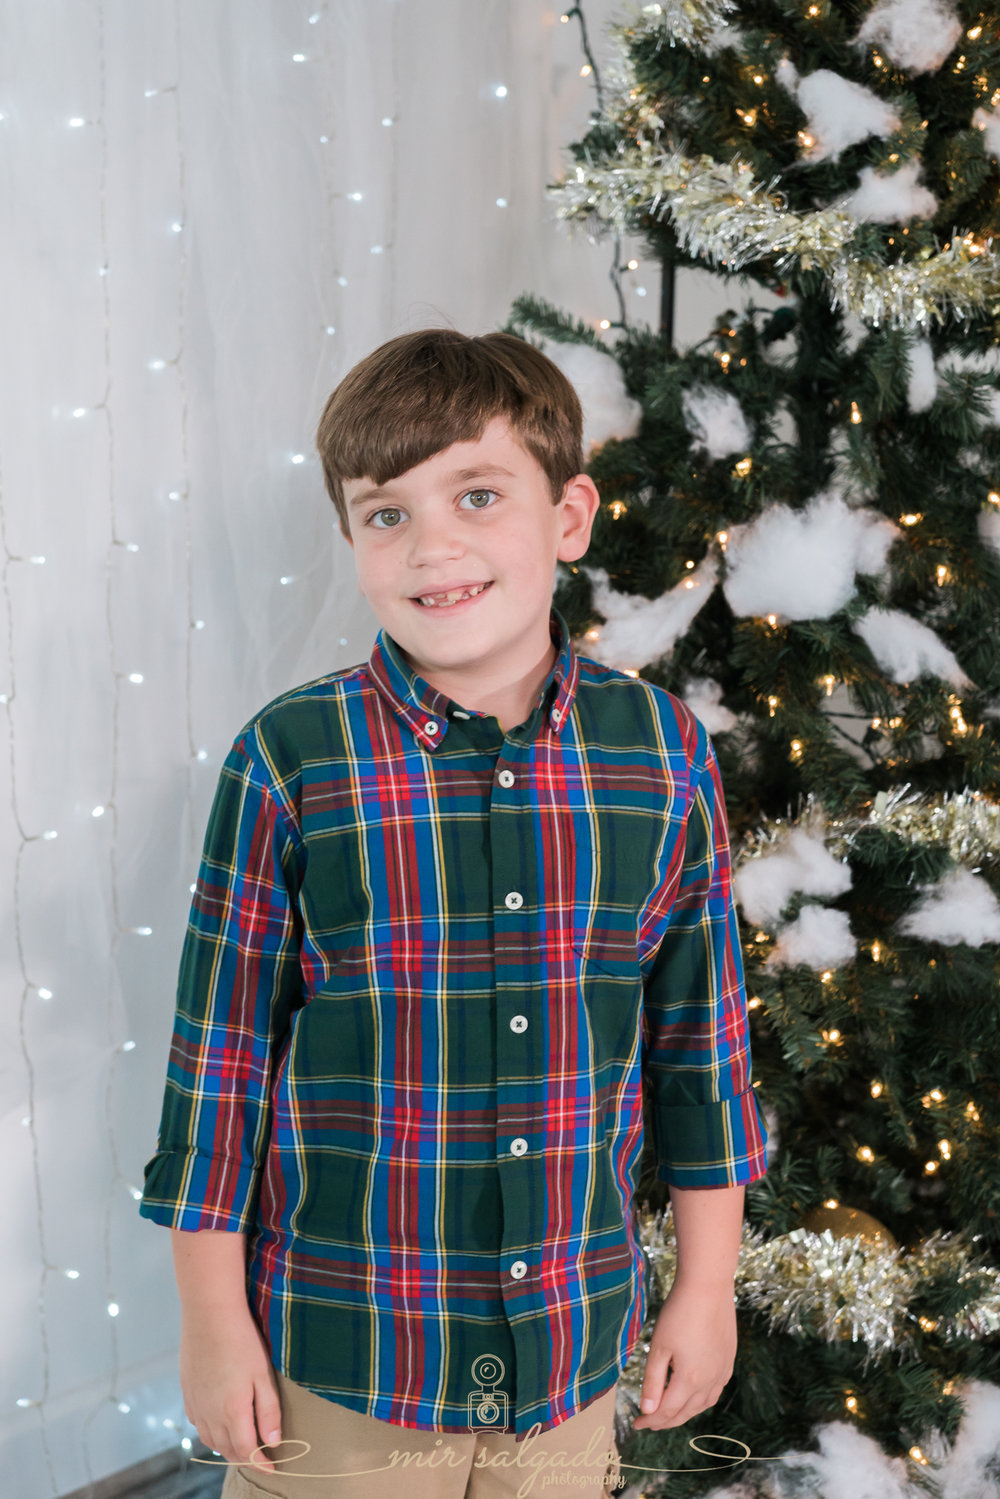 chistmas-photoshoot-2018, tampa-christmas-photoshoot, tampa-christmas-photoshoot-2018, tampa-christmas-portrait-session